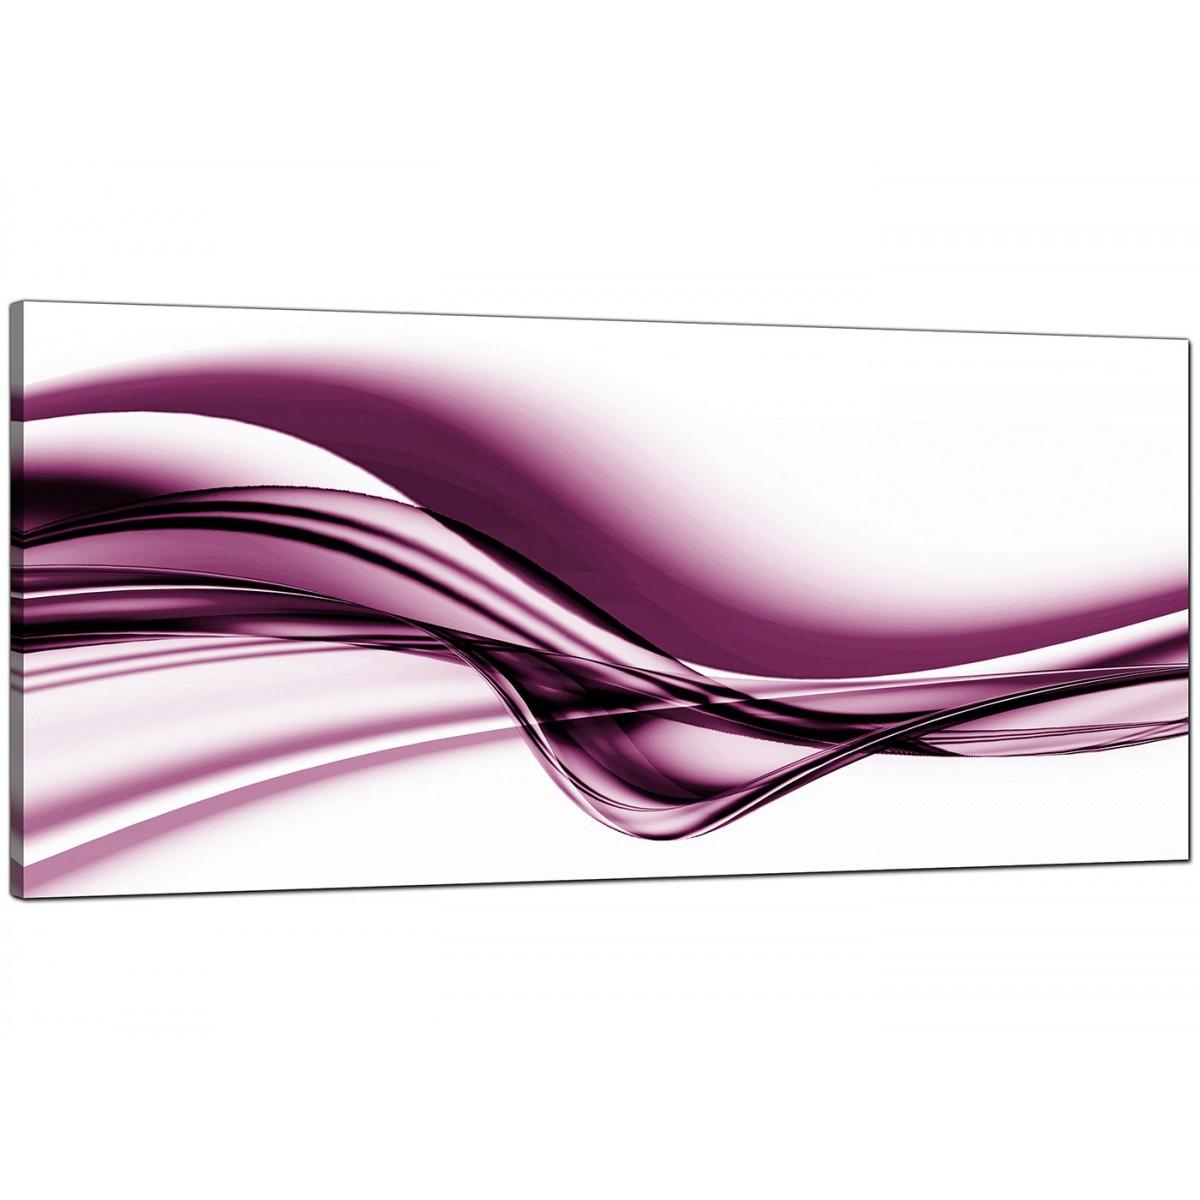 Plum Purple Grey Painting Kitchen Canvas Pictures: Plum Abstract Canvas Art (120cm X 50cm)